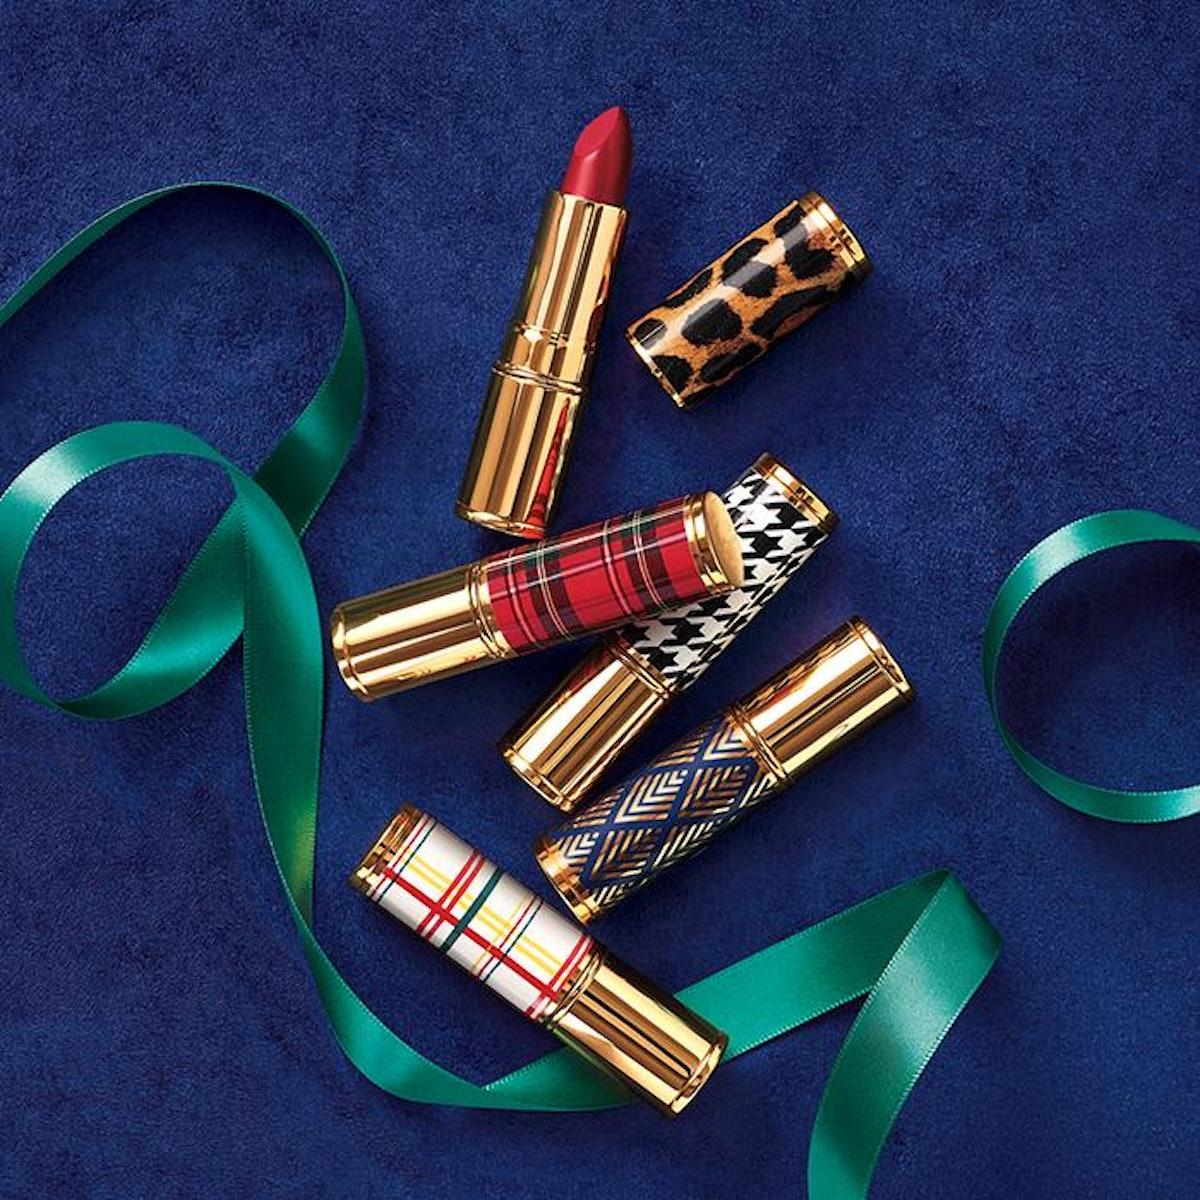 Iconic Avon Lipstick